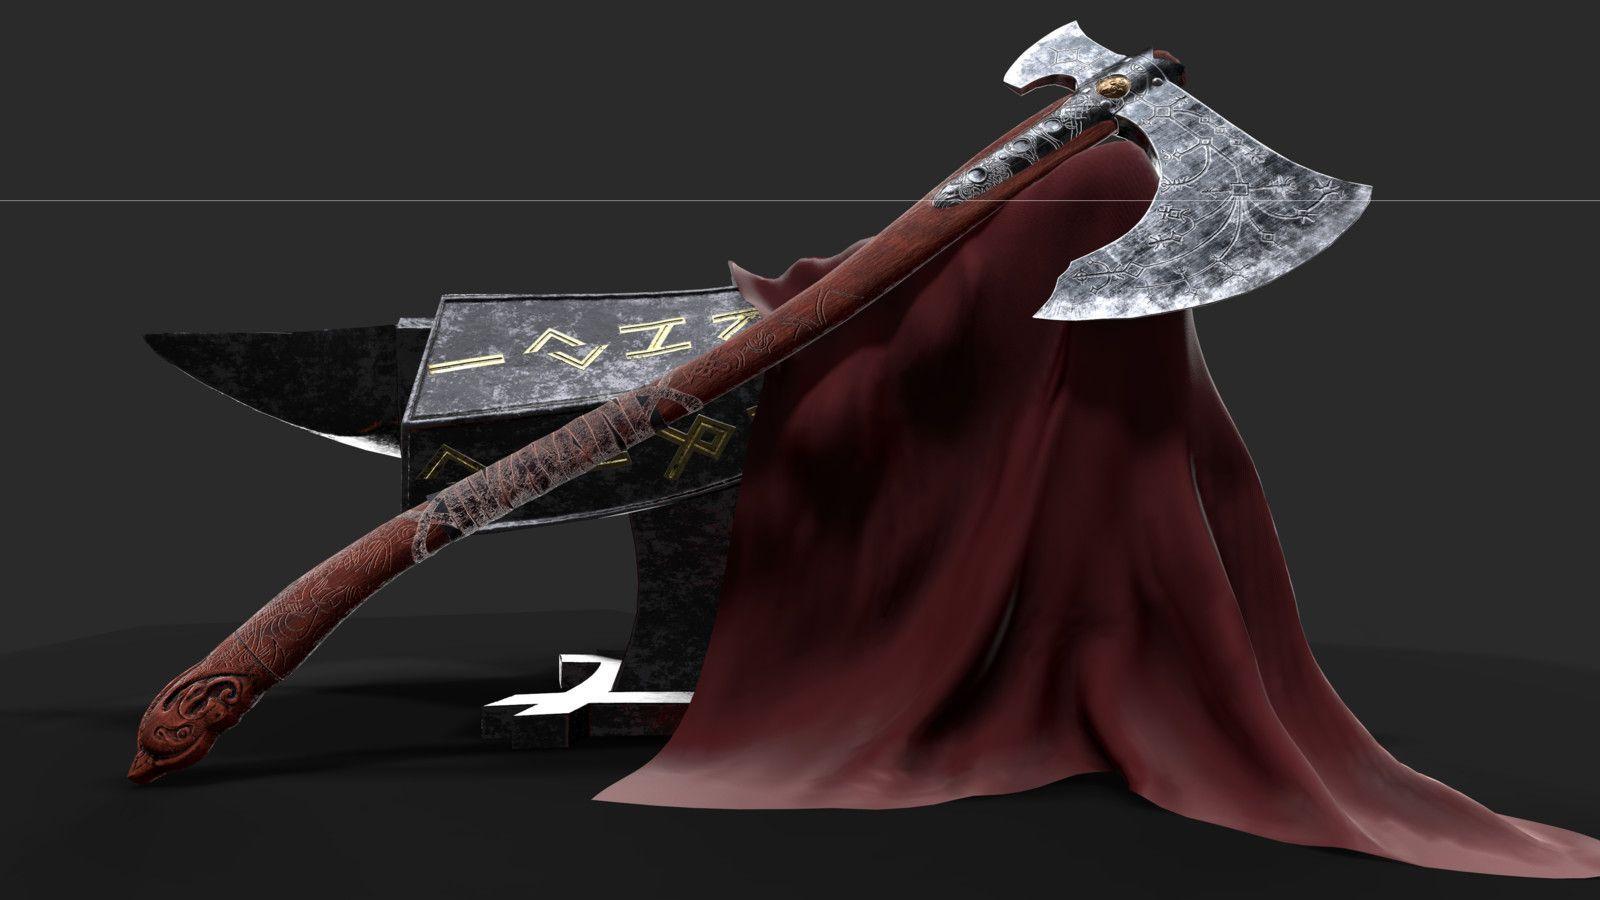 Leviathan Axe God Of War 4 Ninb Adam In 2021 Leviathan Axe God Of War God Of War 4